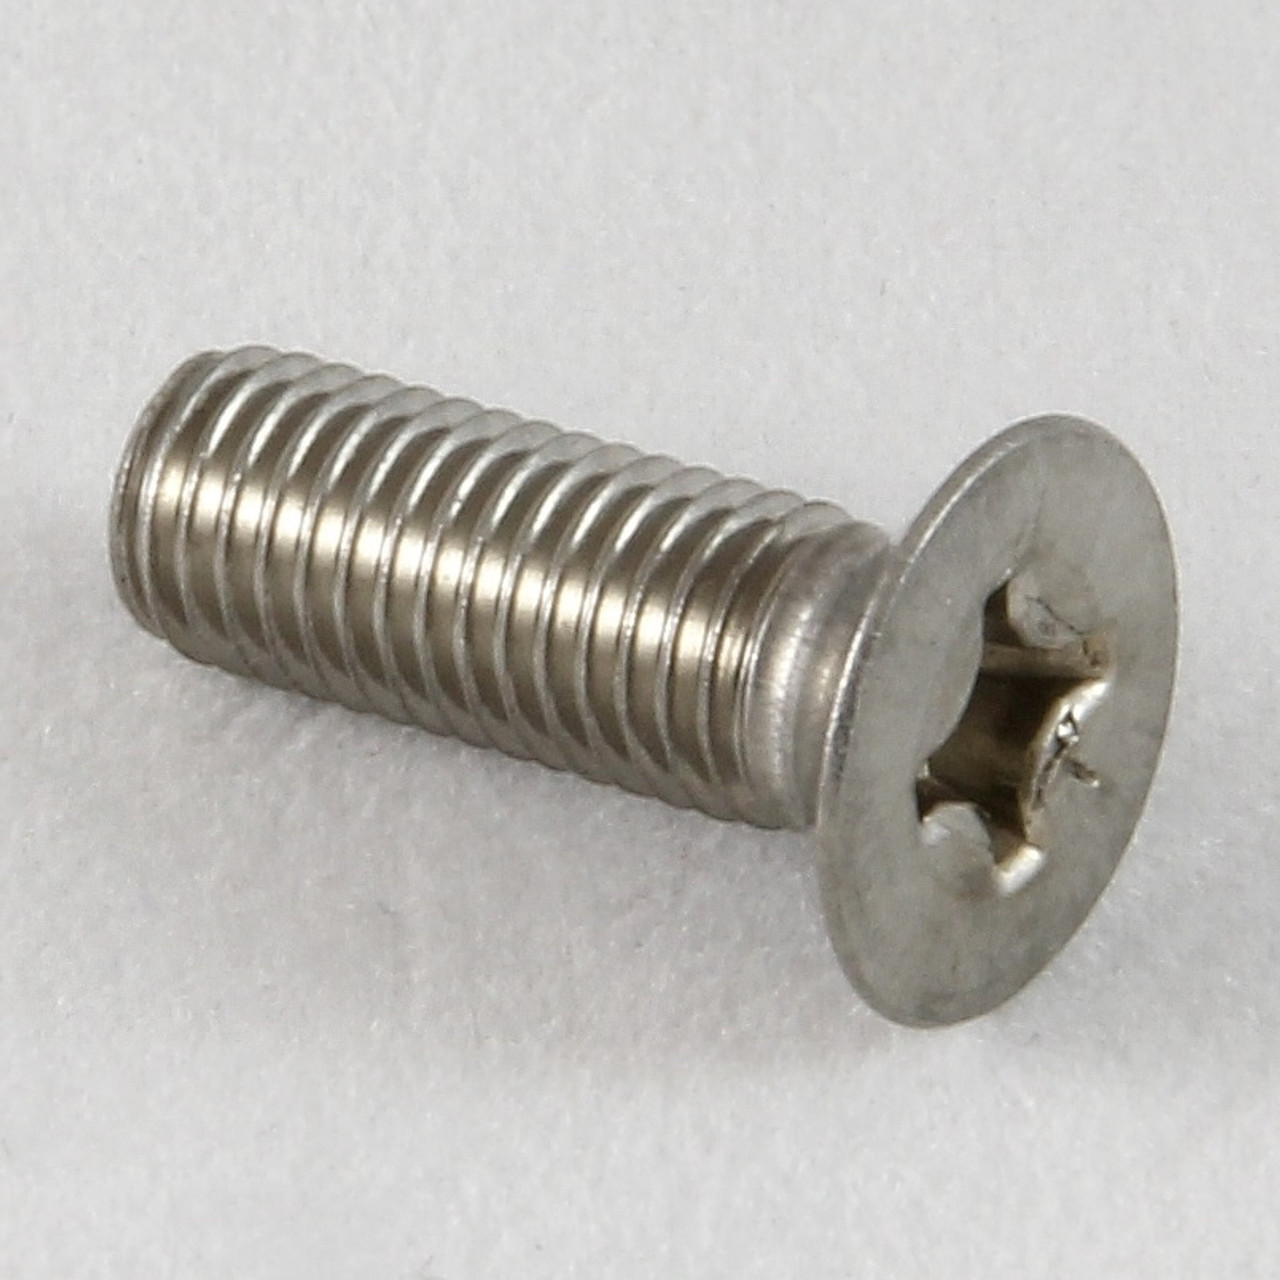 1//4UNF X 3//4 SLOT COUNTERSUNK MACHINE SCREWS STEEL ZINC PLATED QTY 10